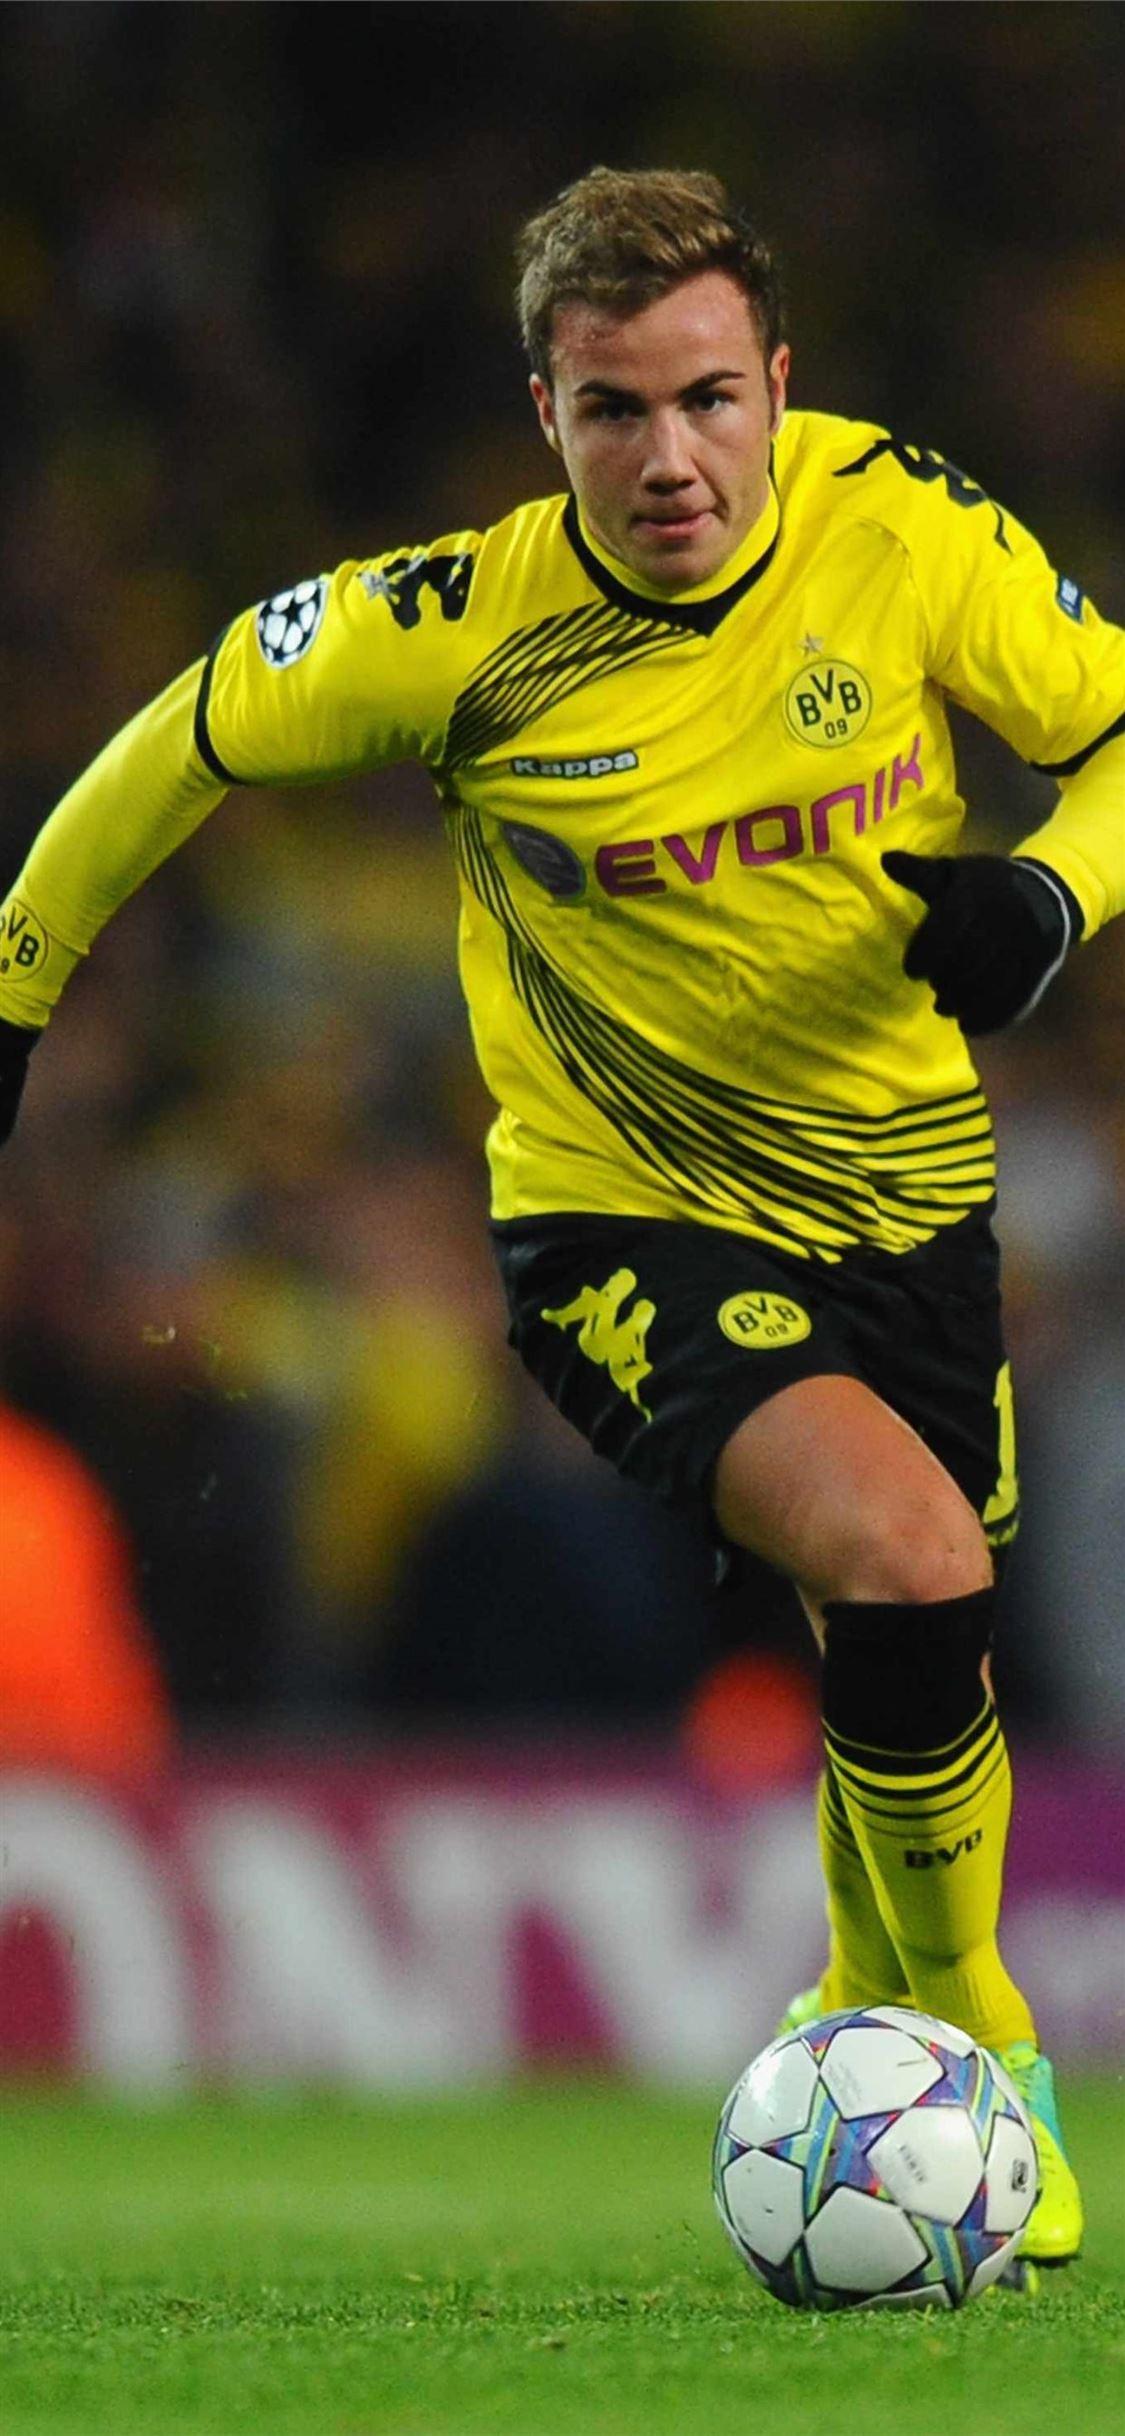 97 Mario Gotze Borussia Dortmund On Afari Iphone X Wallpapers Free Download